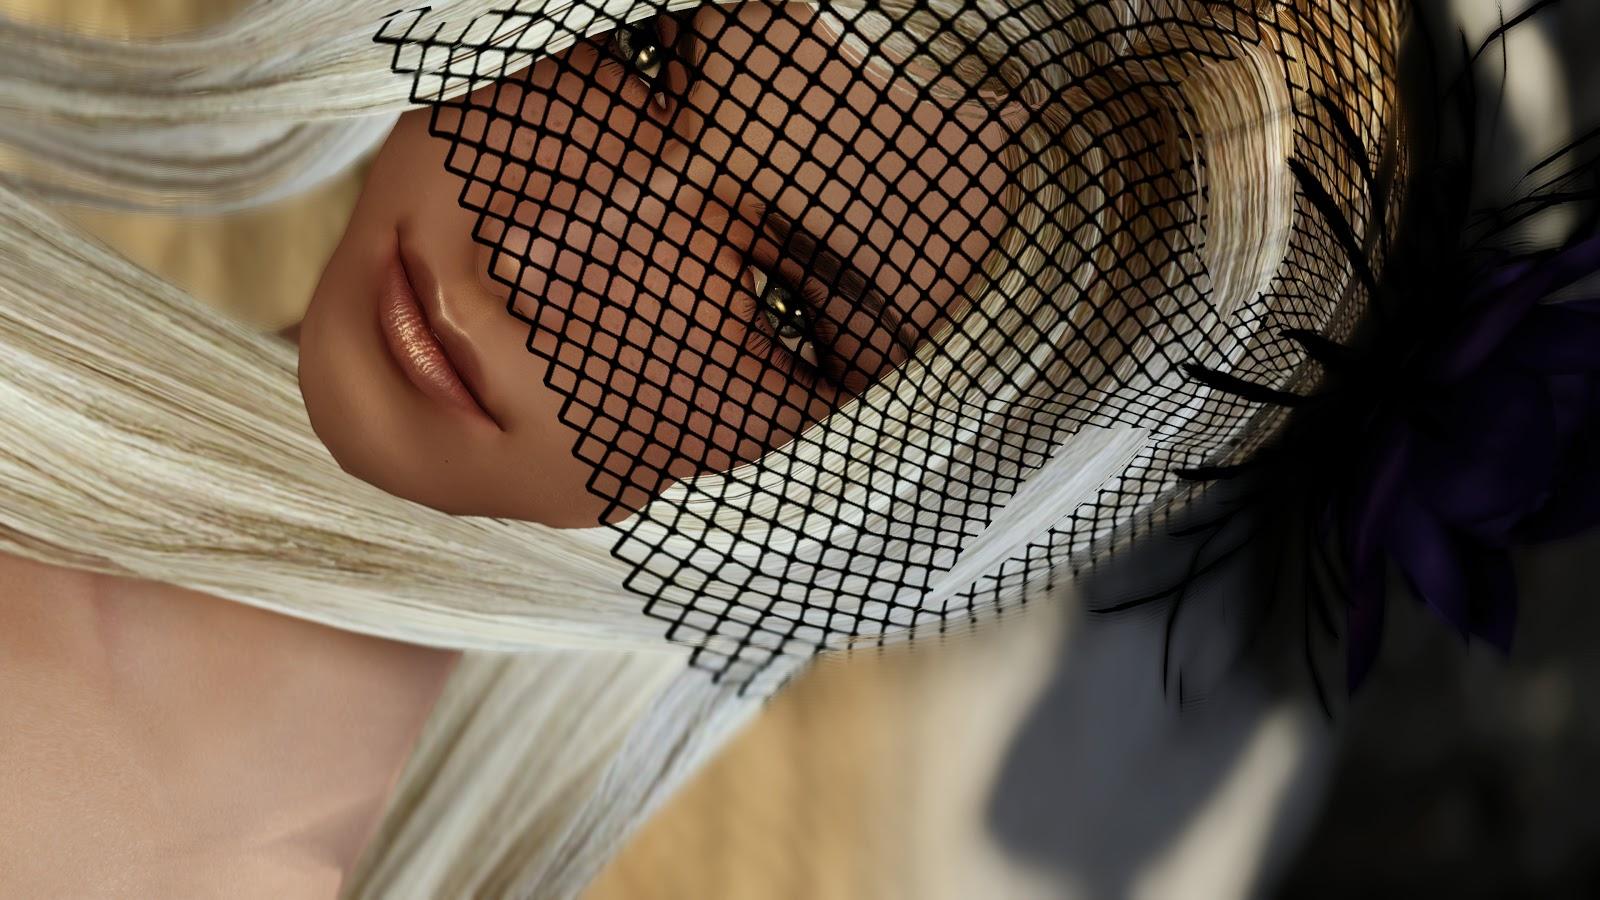 skyrim rose veils various colors with Diana